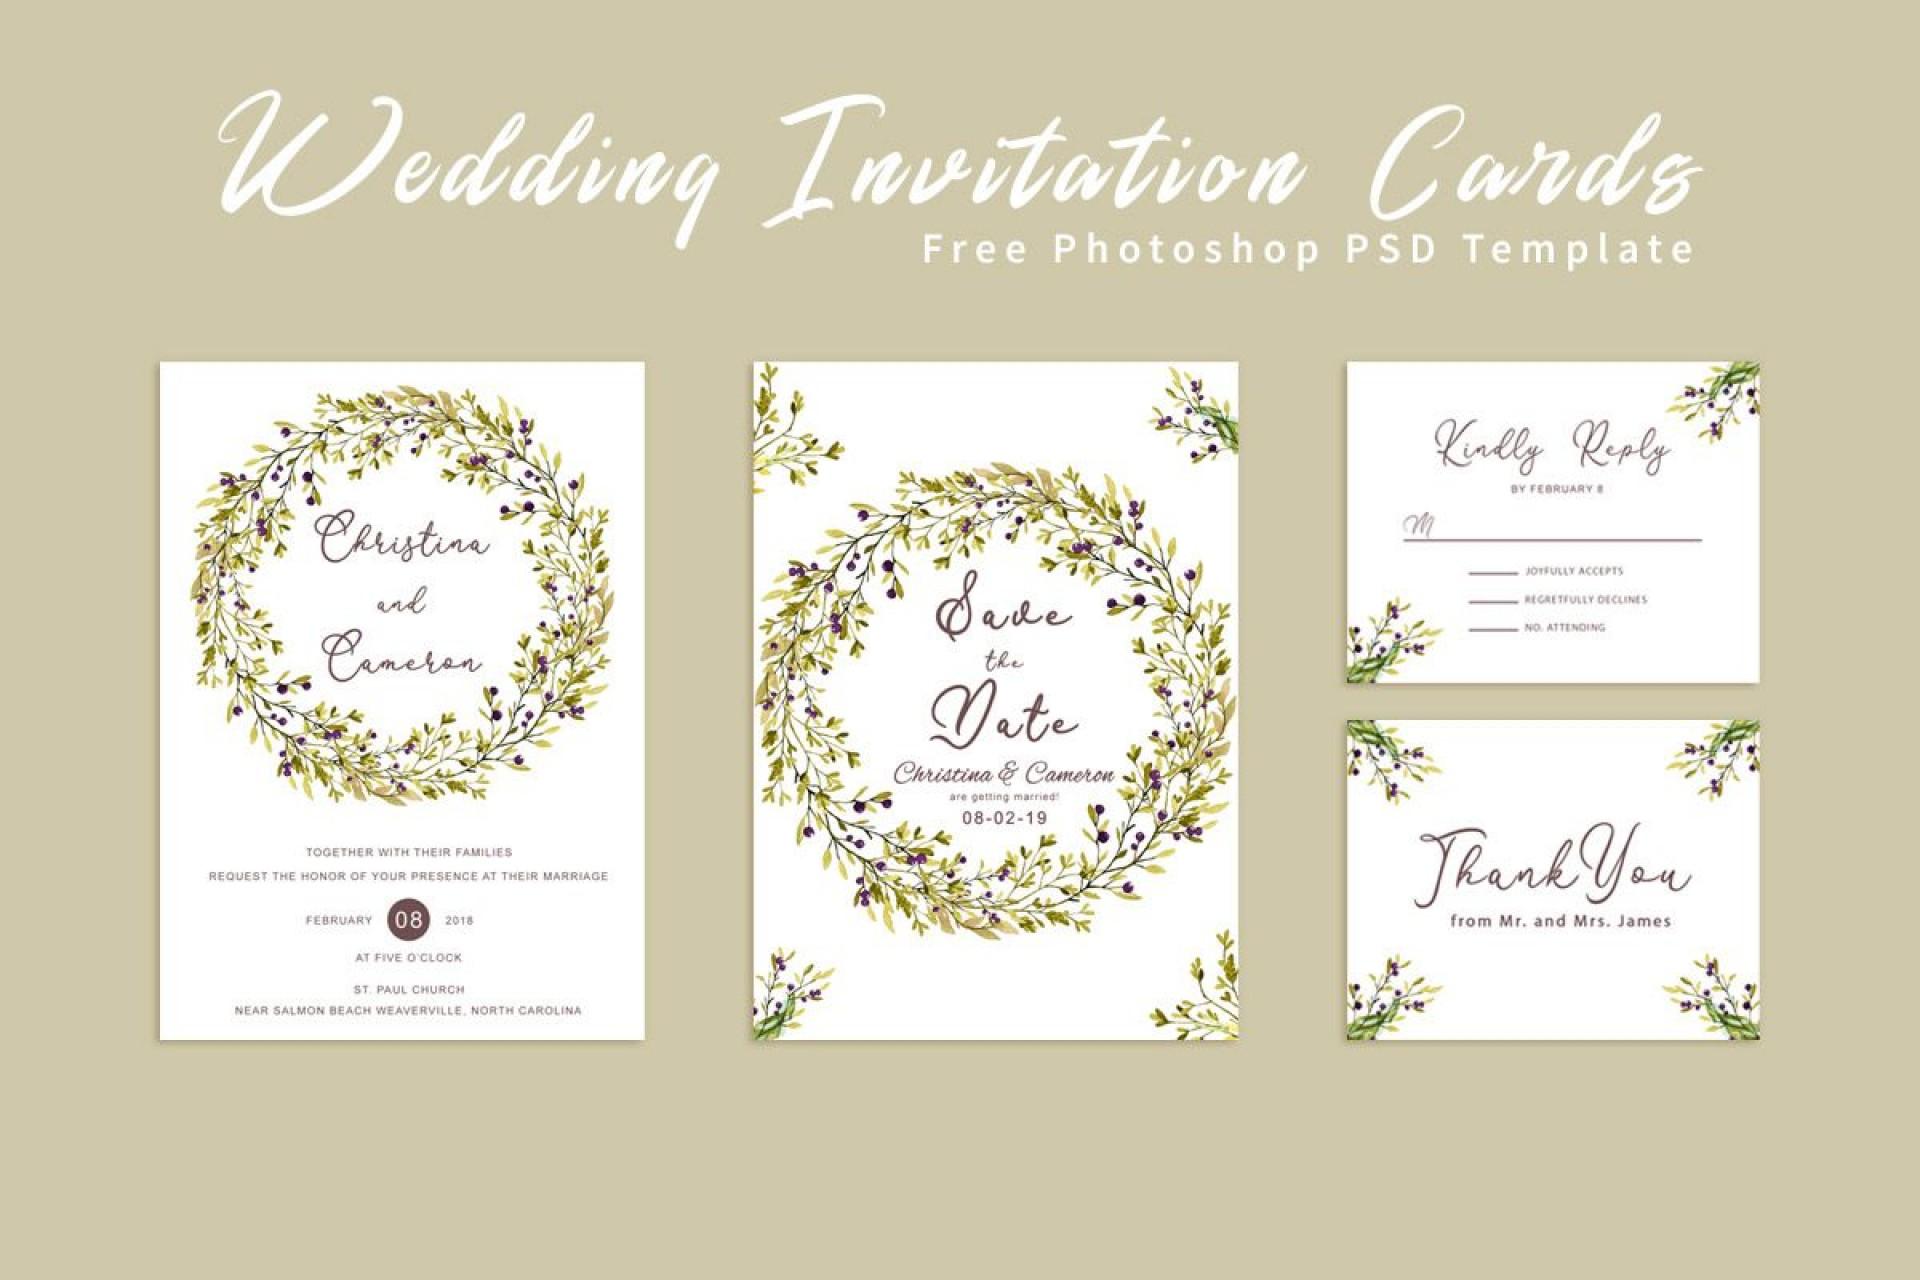 004 Fantastic Photoshop Wedding Invitation Template Inspiration  Templates Hindu Psd Free Download Card1920